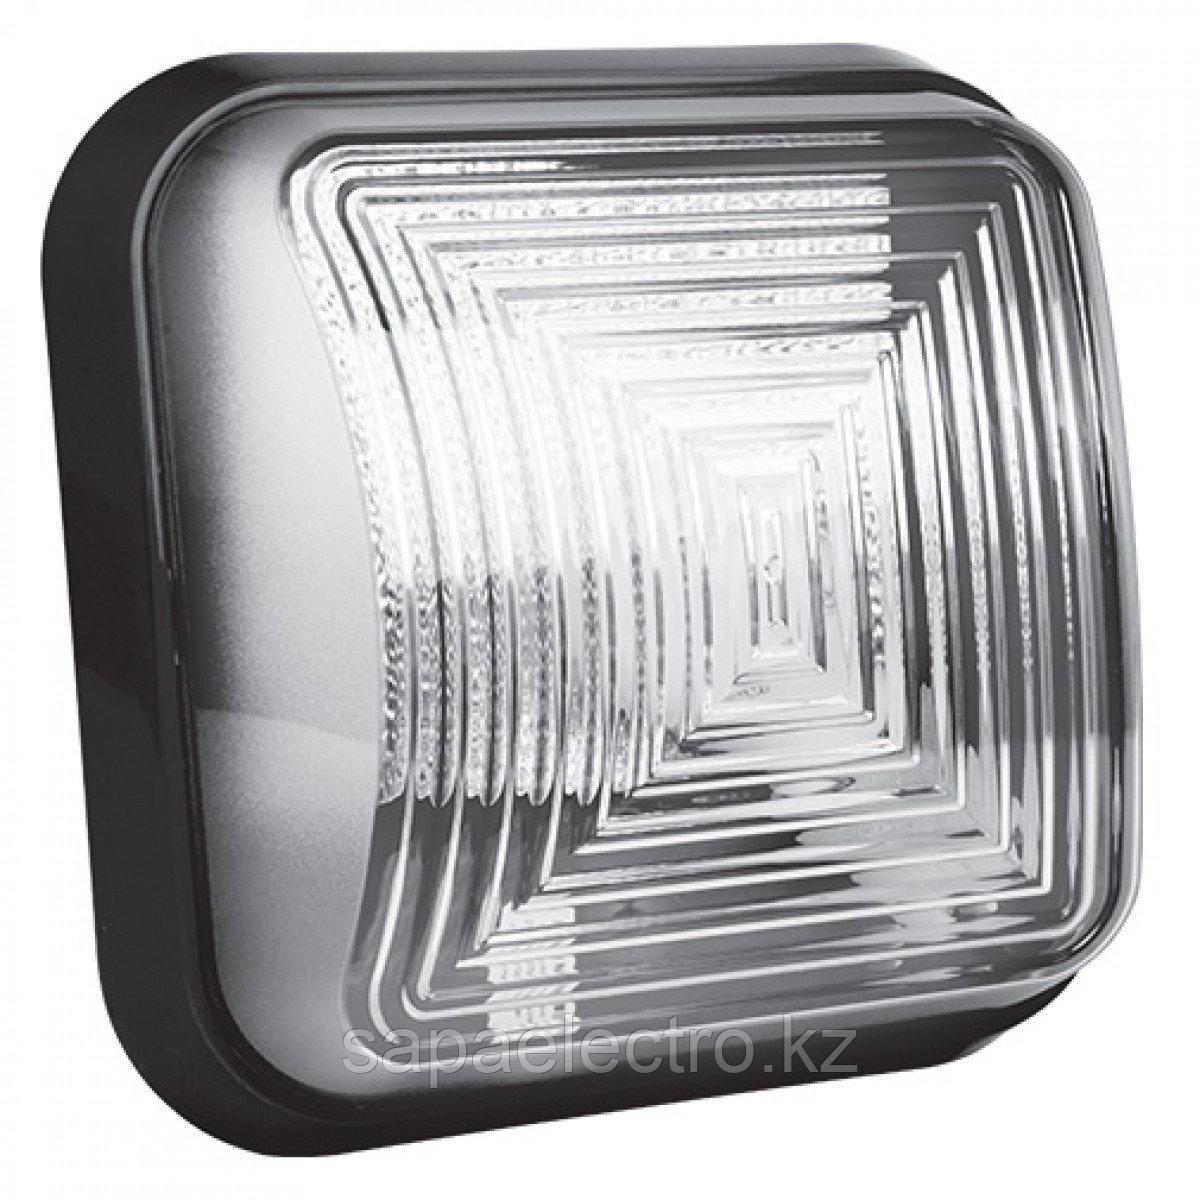 Свет-к KARE OPTIK Черн/Siyah E27 MEGALUX (TS)36шт,1